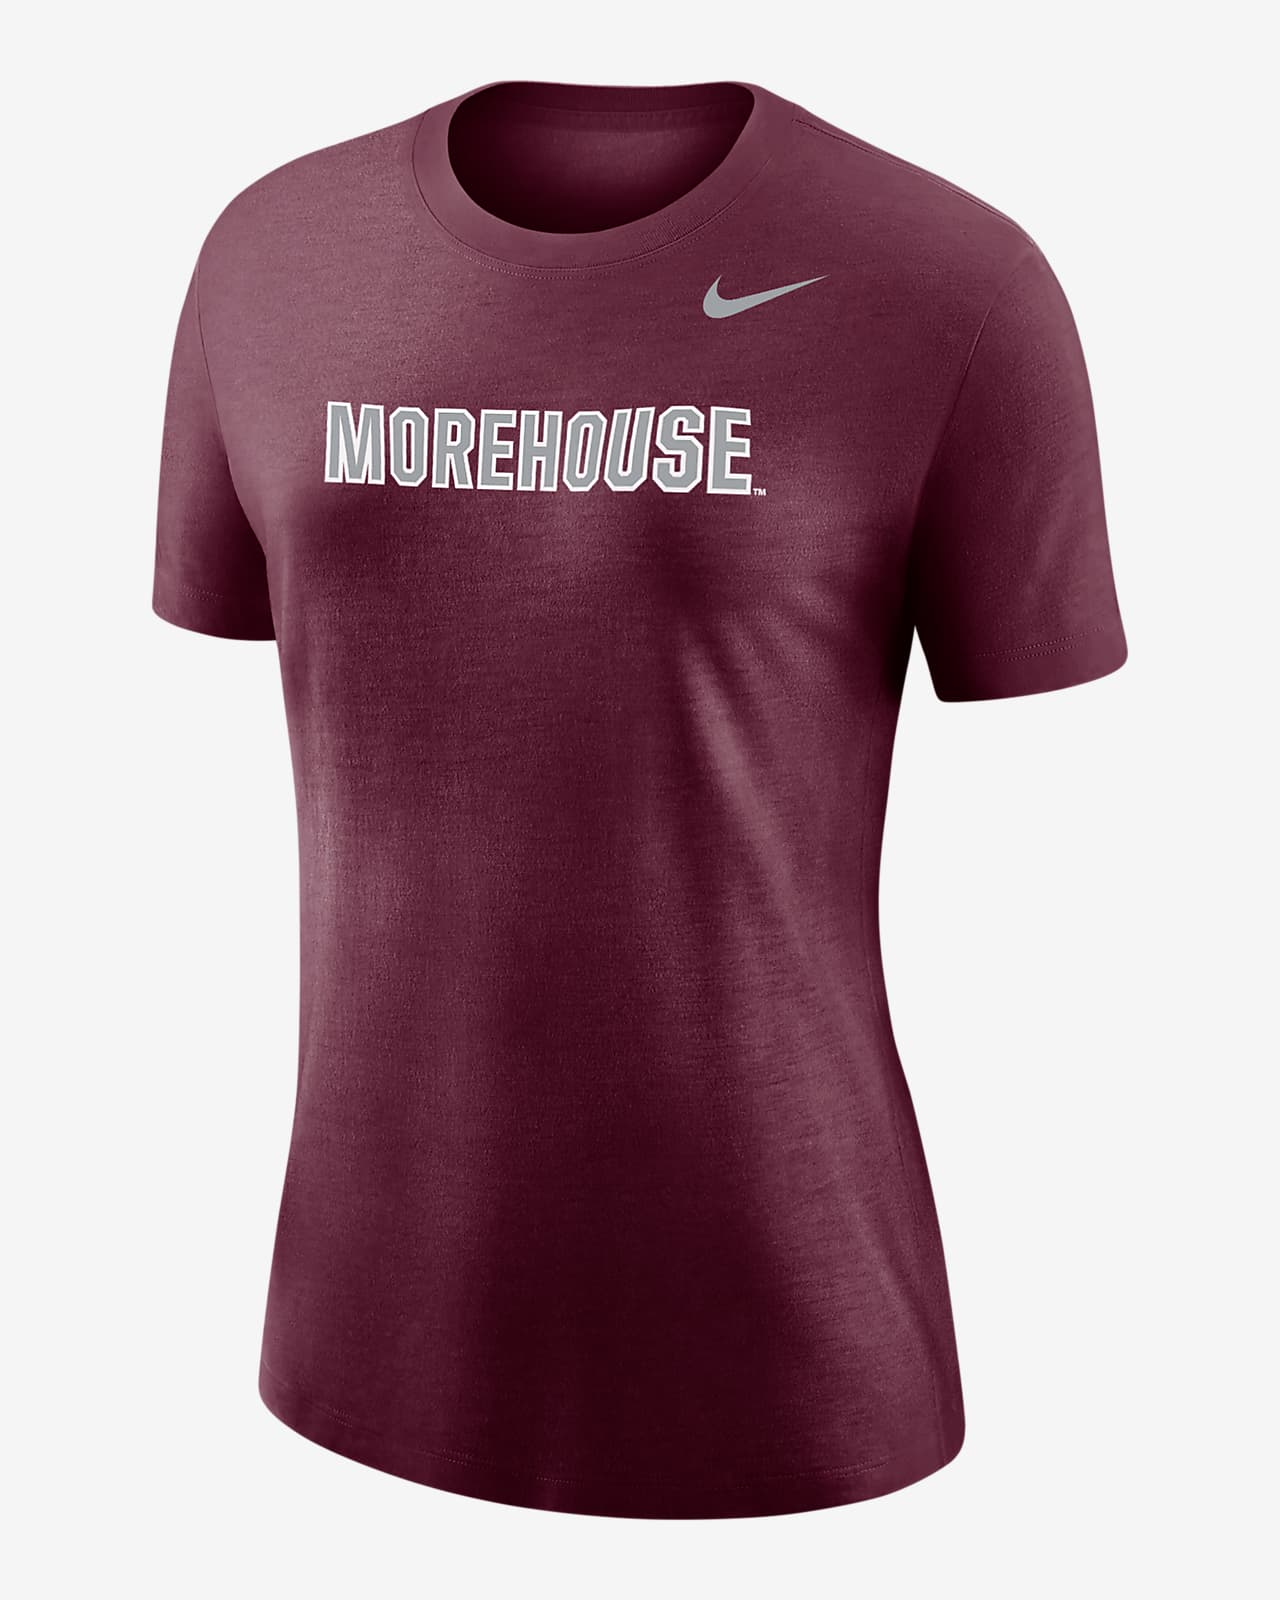 Nike College (Morehouse) Women's T-Shirt